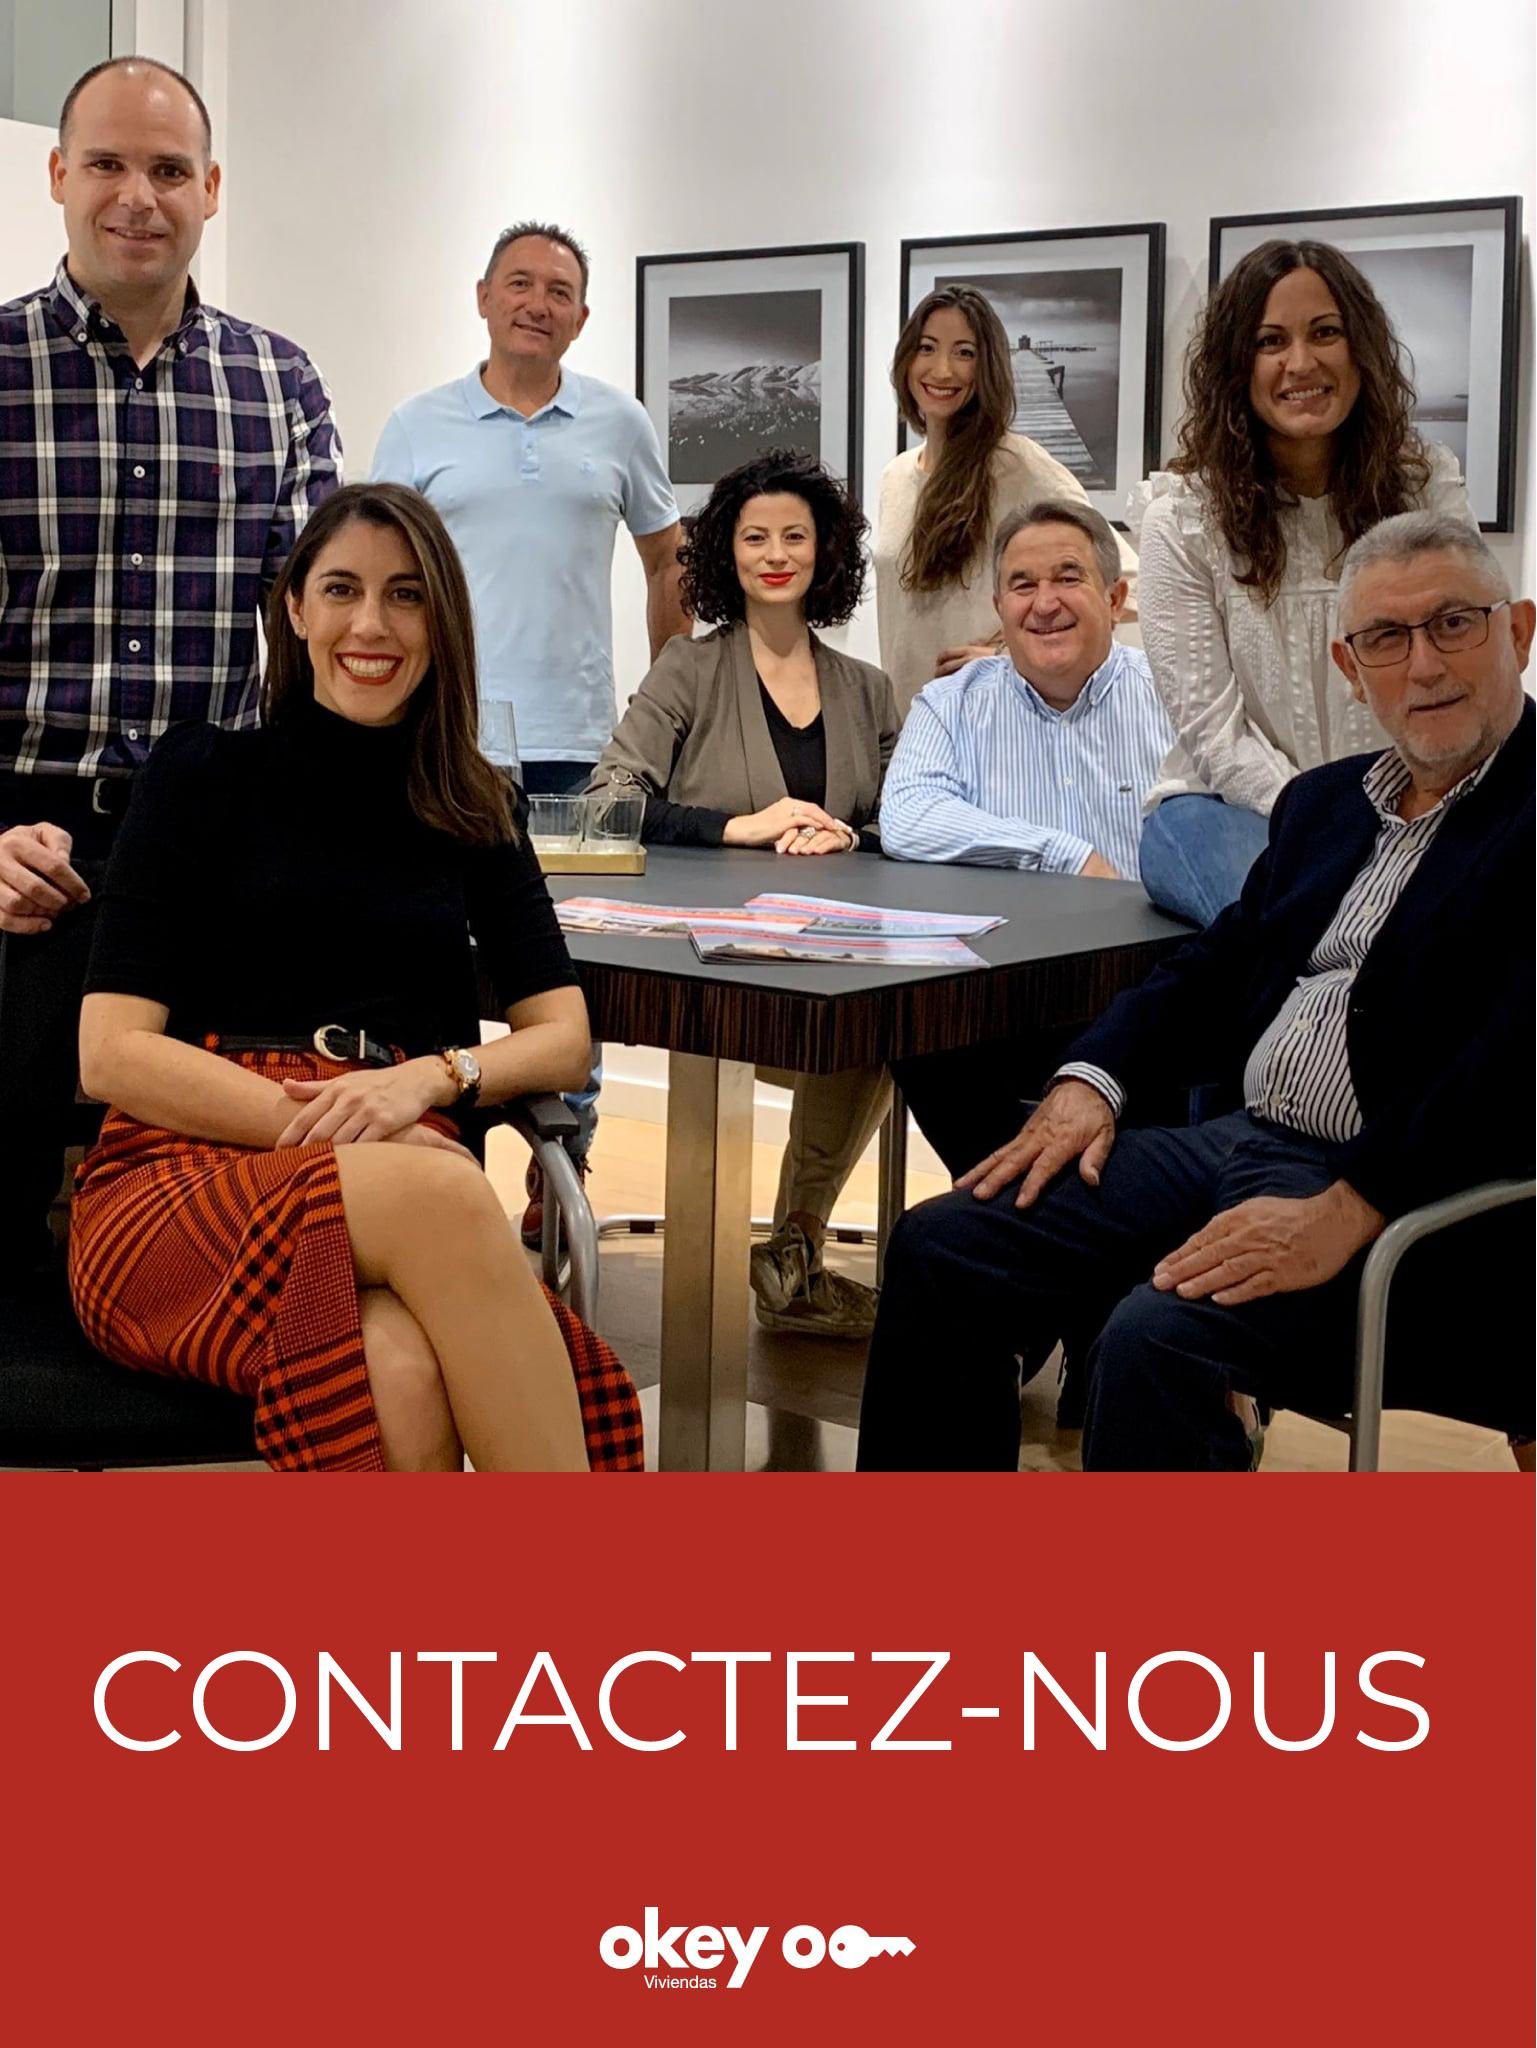 https://okeyviviendas.com/wp-content/uploads/2020/11/CONTACTO-OKEY-VIVIENDAS-03.jpg